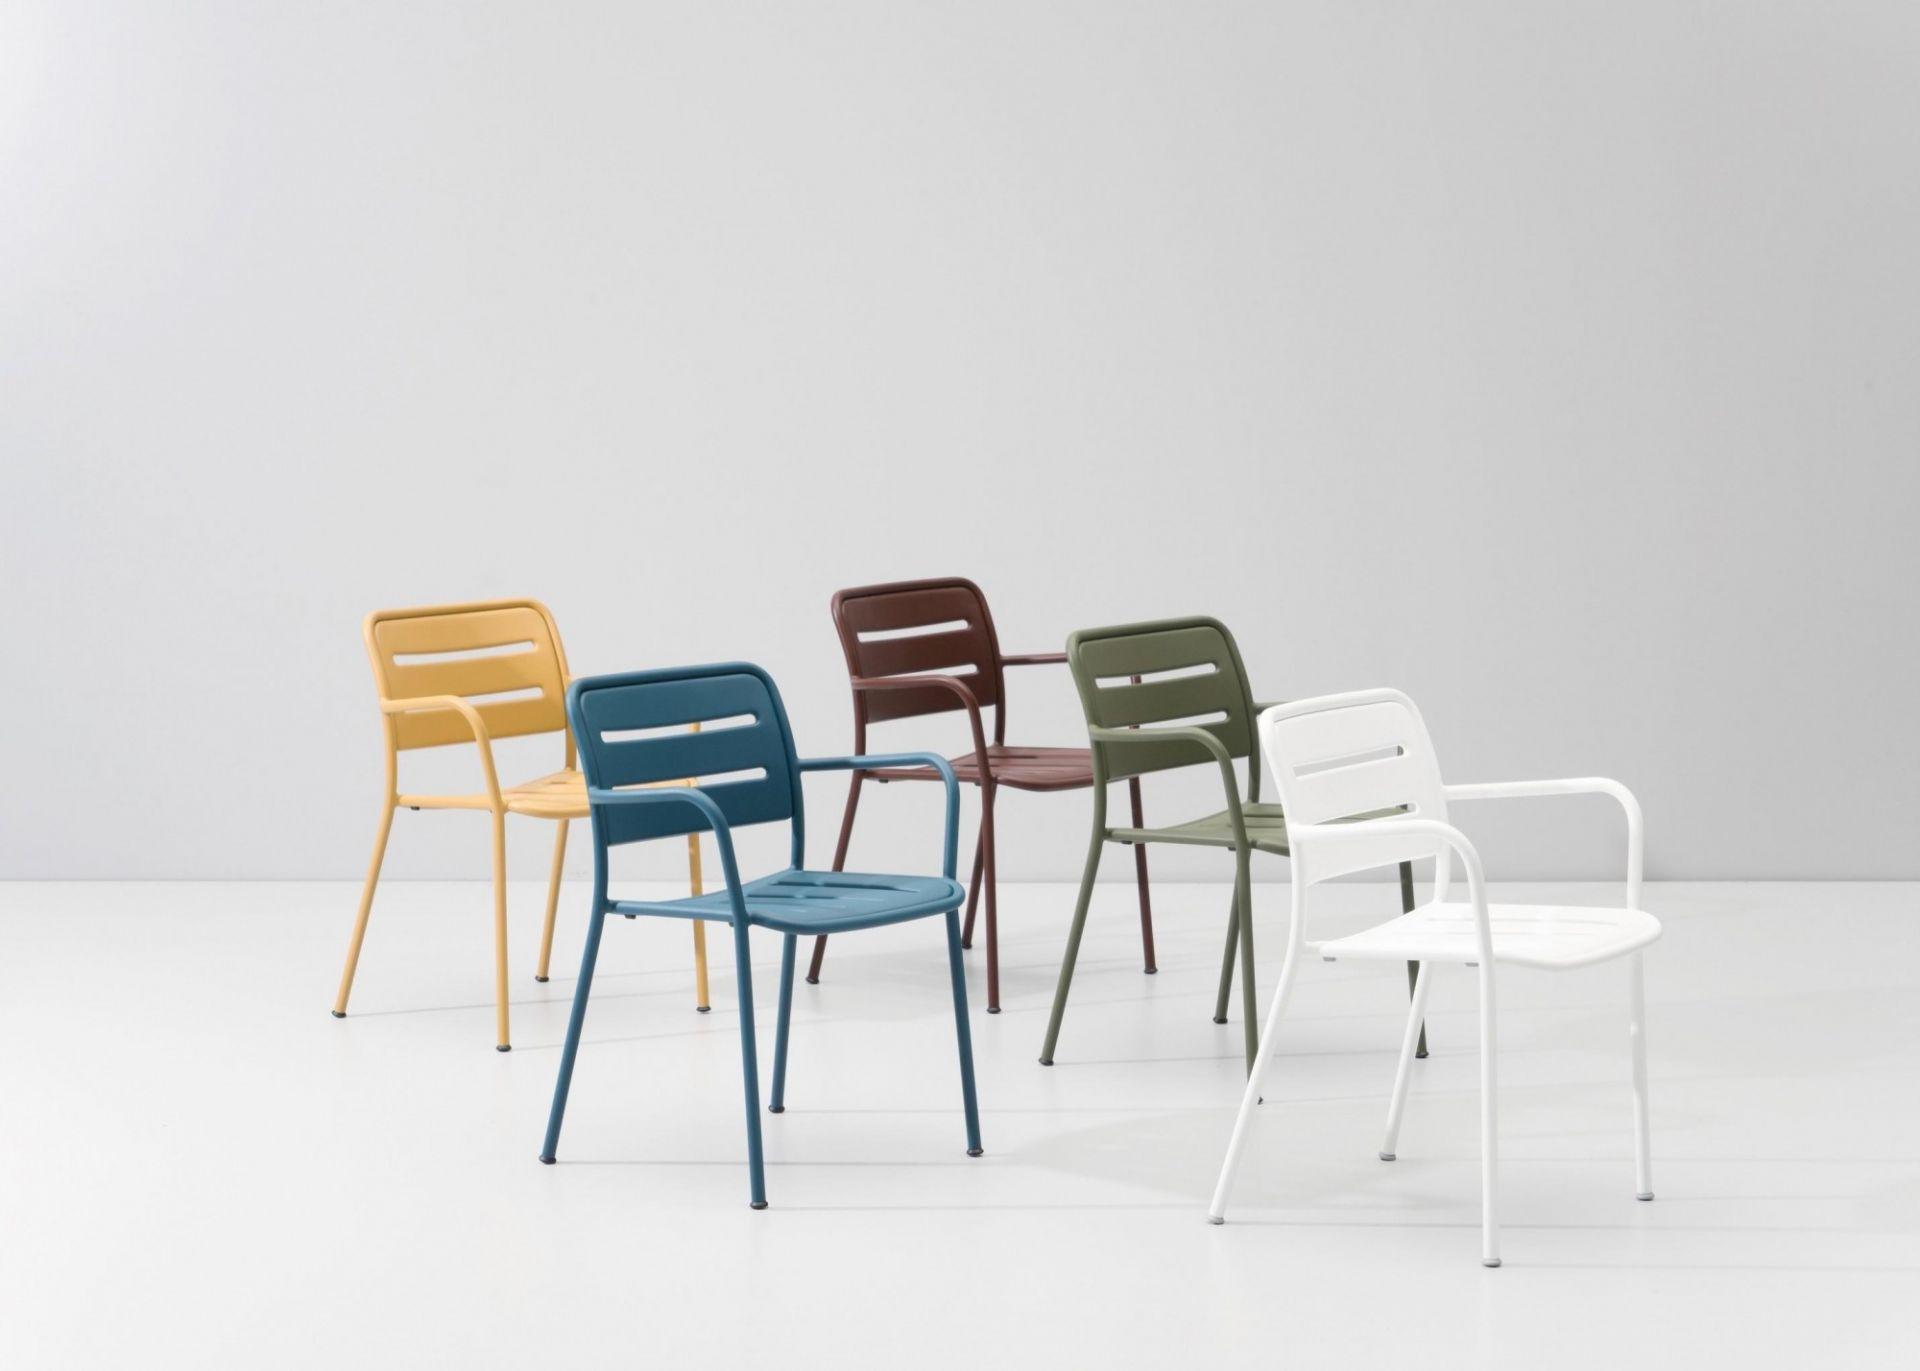 Village Dining Chair Studio Italia